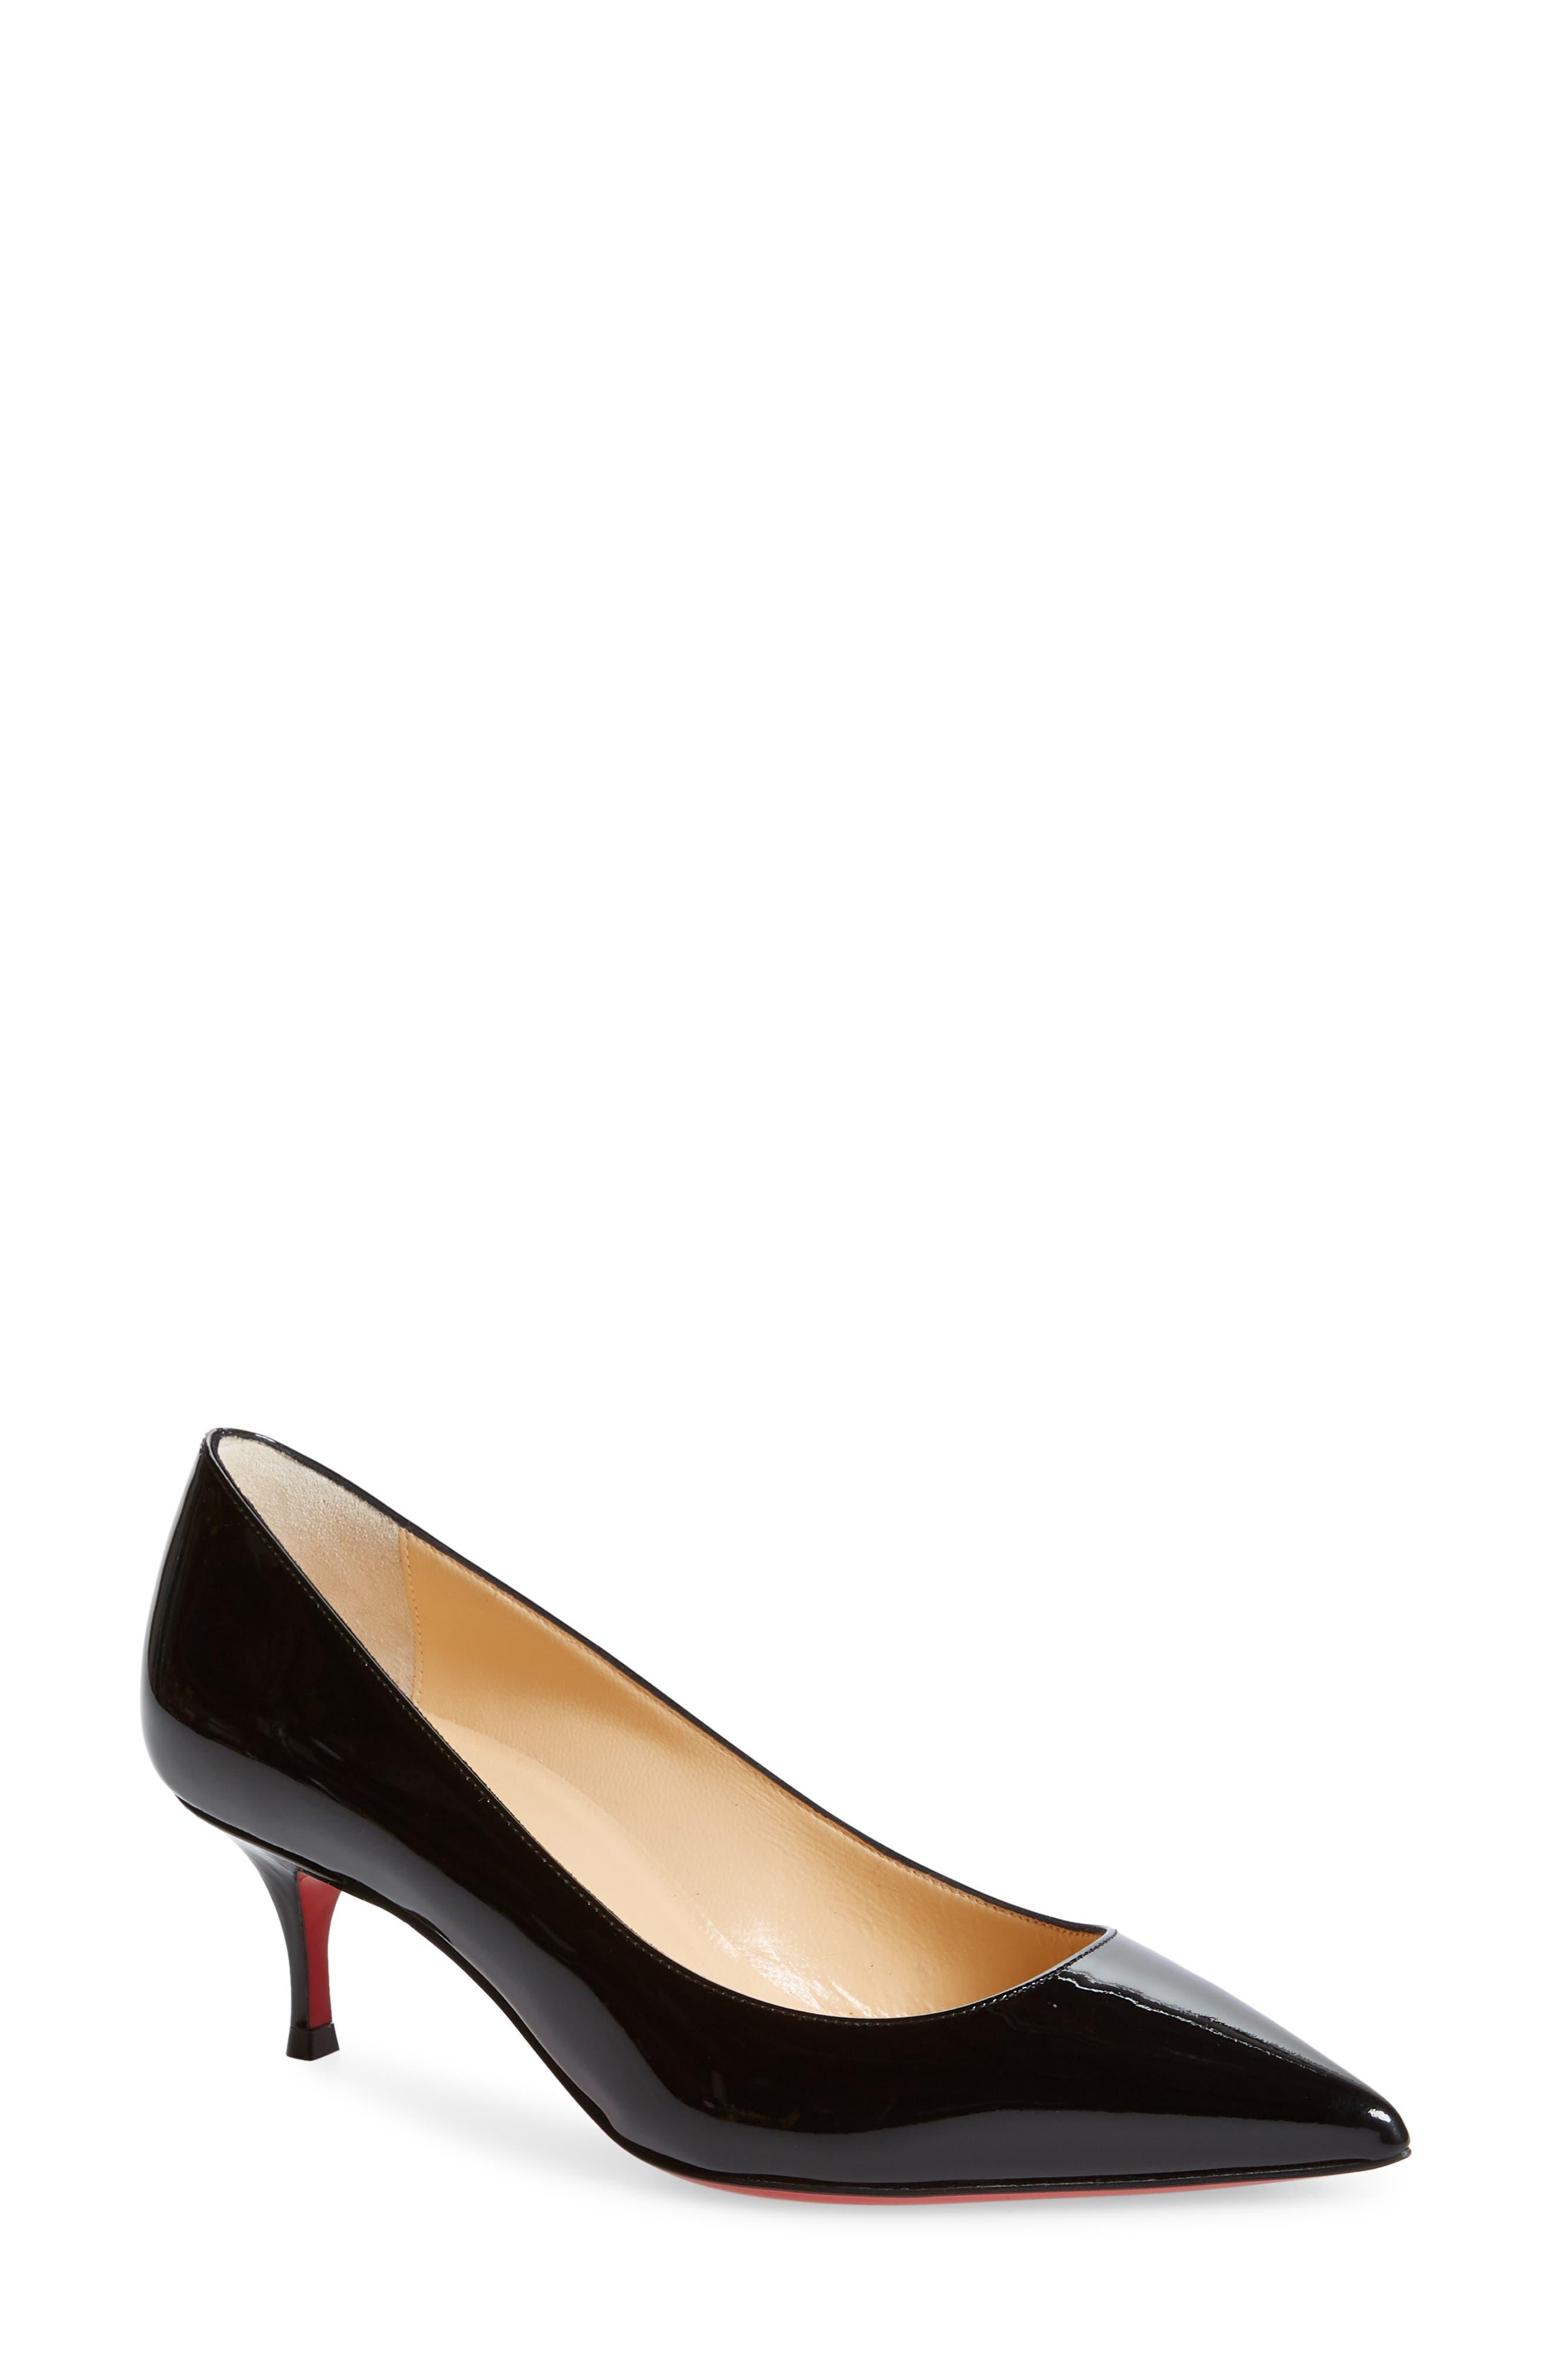 Christian Louboutin Kate Kitten Heel Pointy Toe Pump, Black